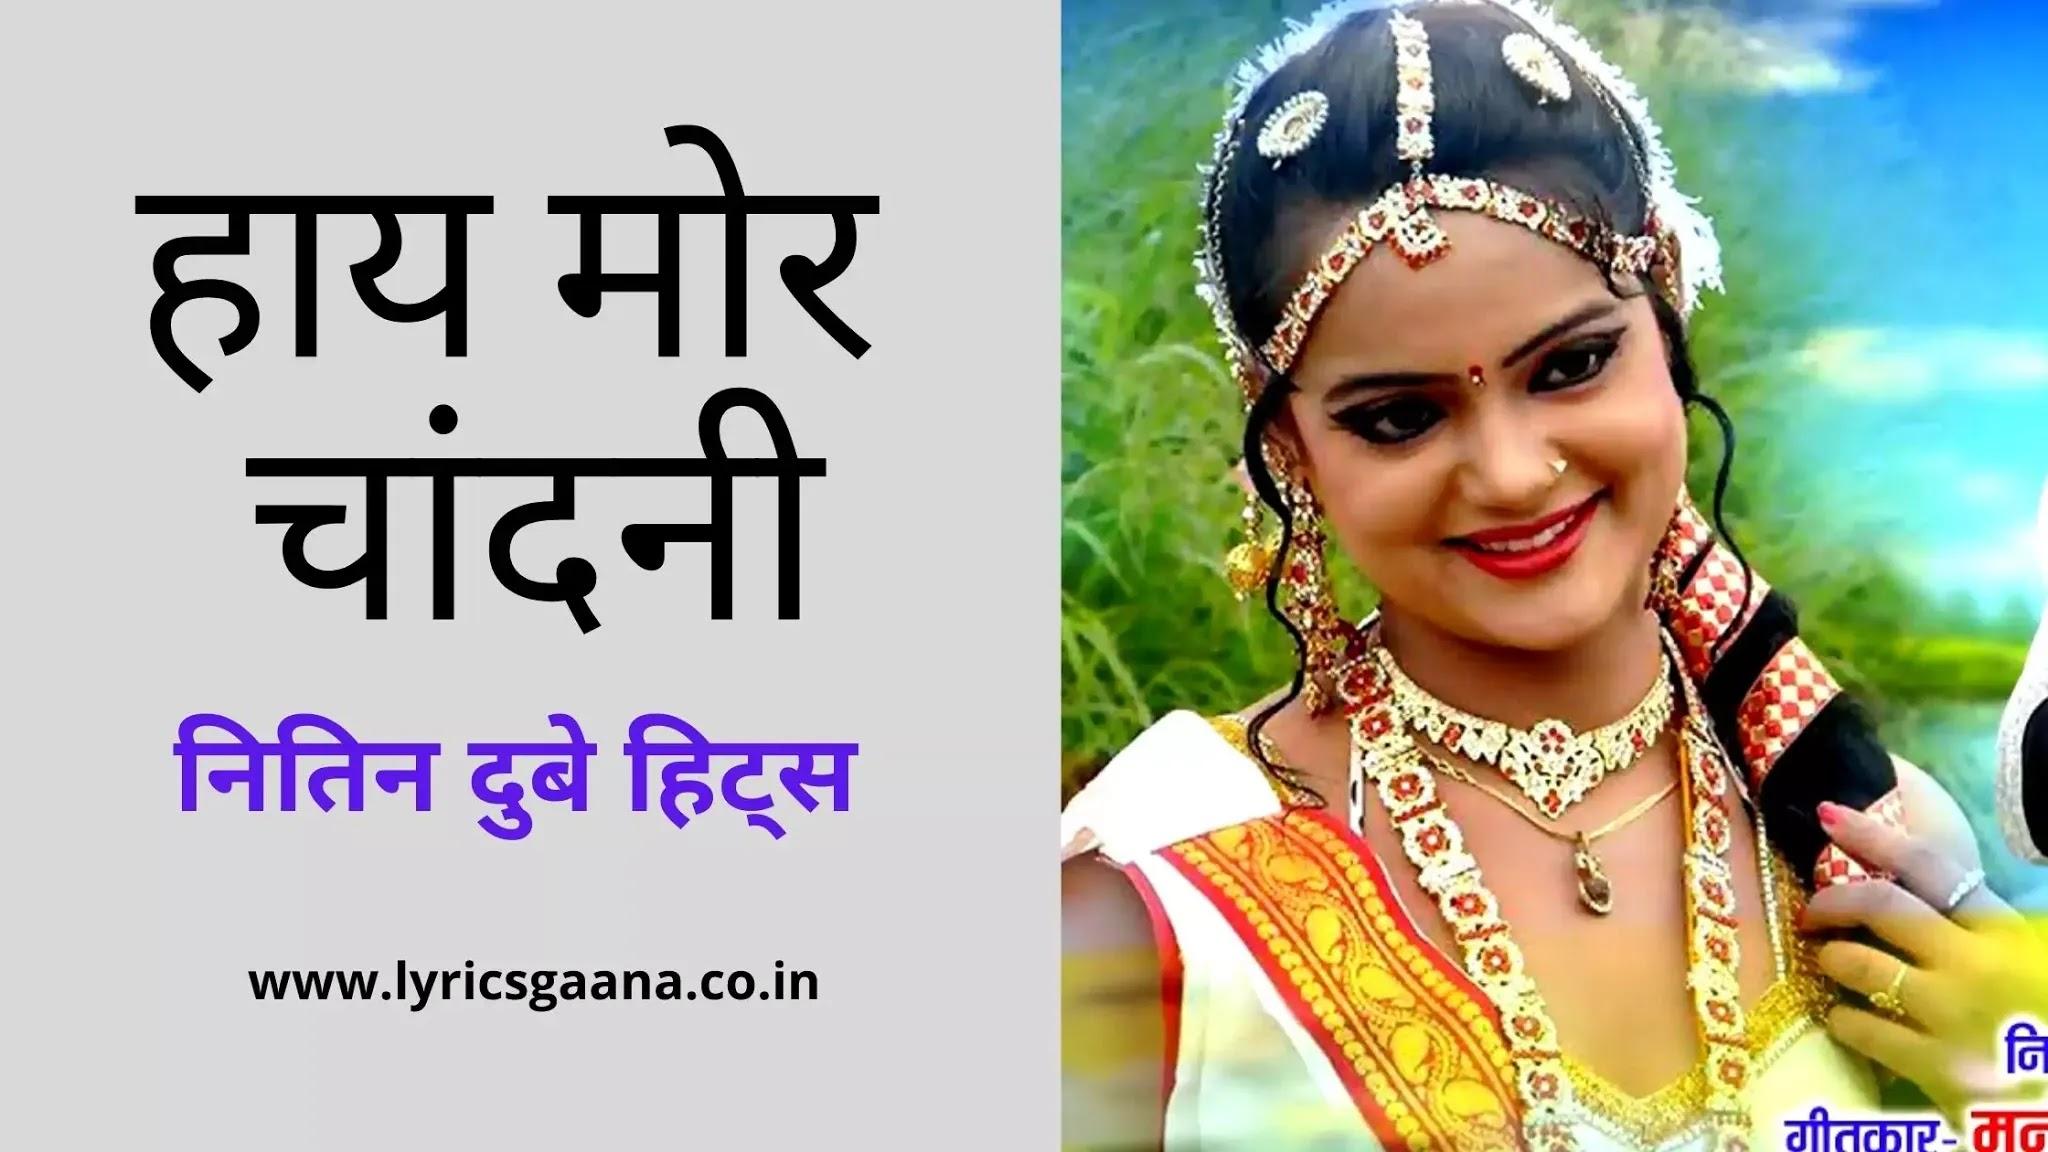 Hay Mor Chandani Cg Song  हाय मोर चांदनी Chhattisgarhi Gana